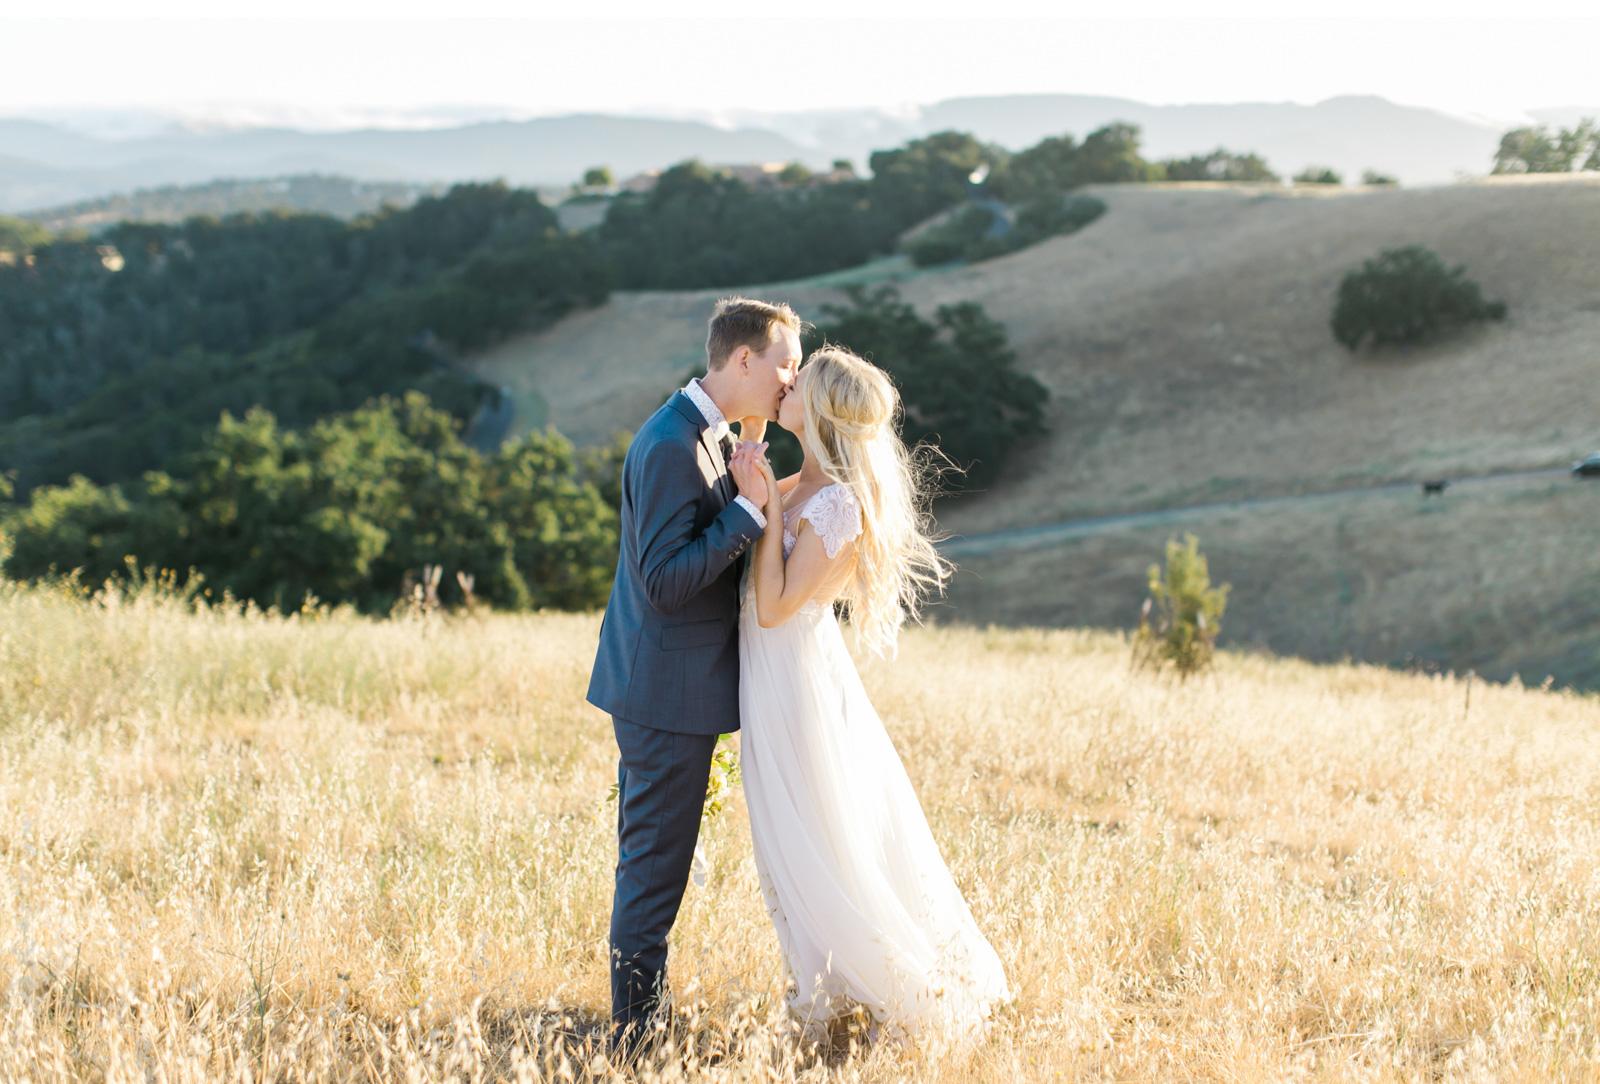 Natalie-Schutt-Photography's-Wedding-Style-Me-Pretty-Paso-Robles_06.jpg